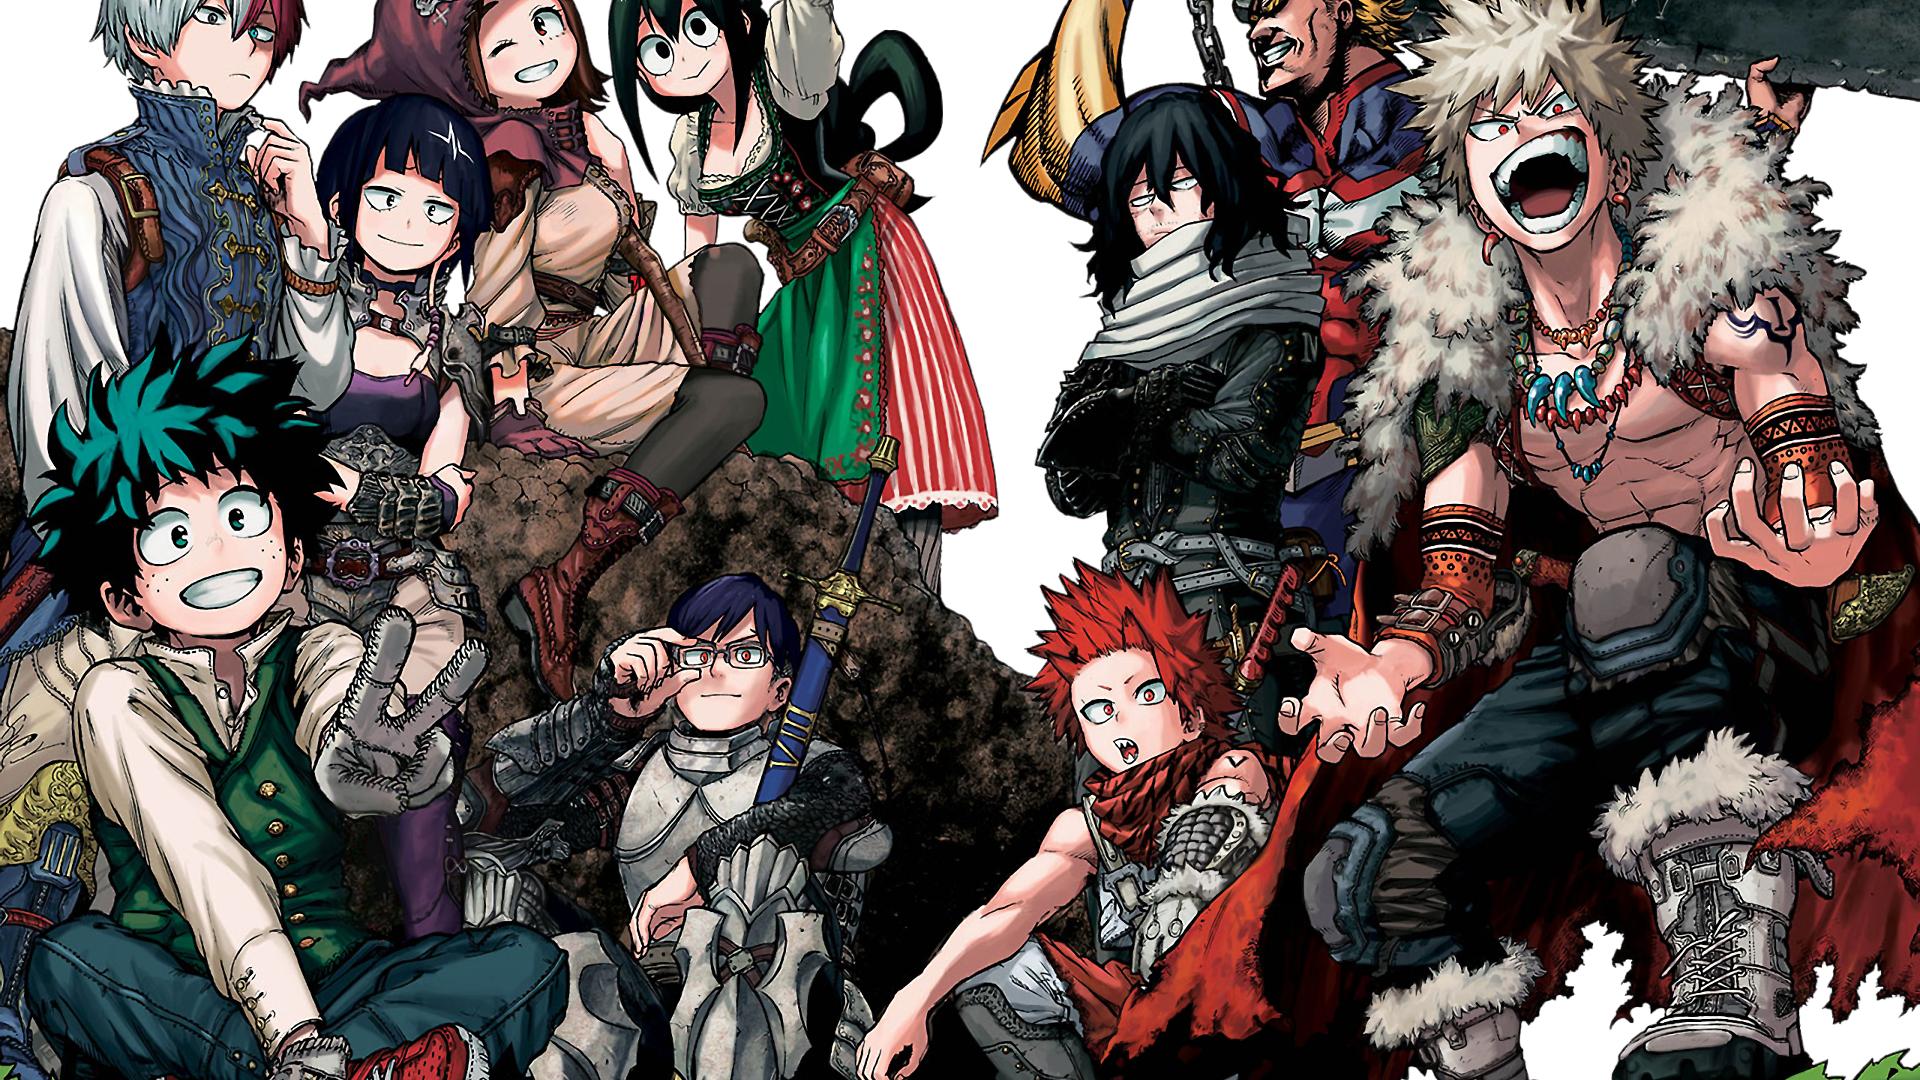 Anime 4k My Hero Academia Wallpapers - Wallpaper Cave